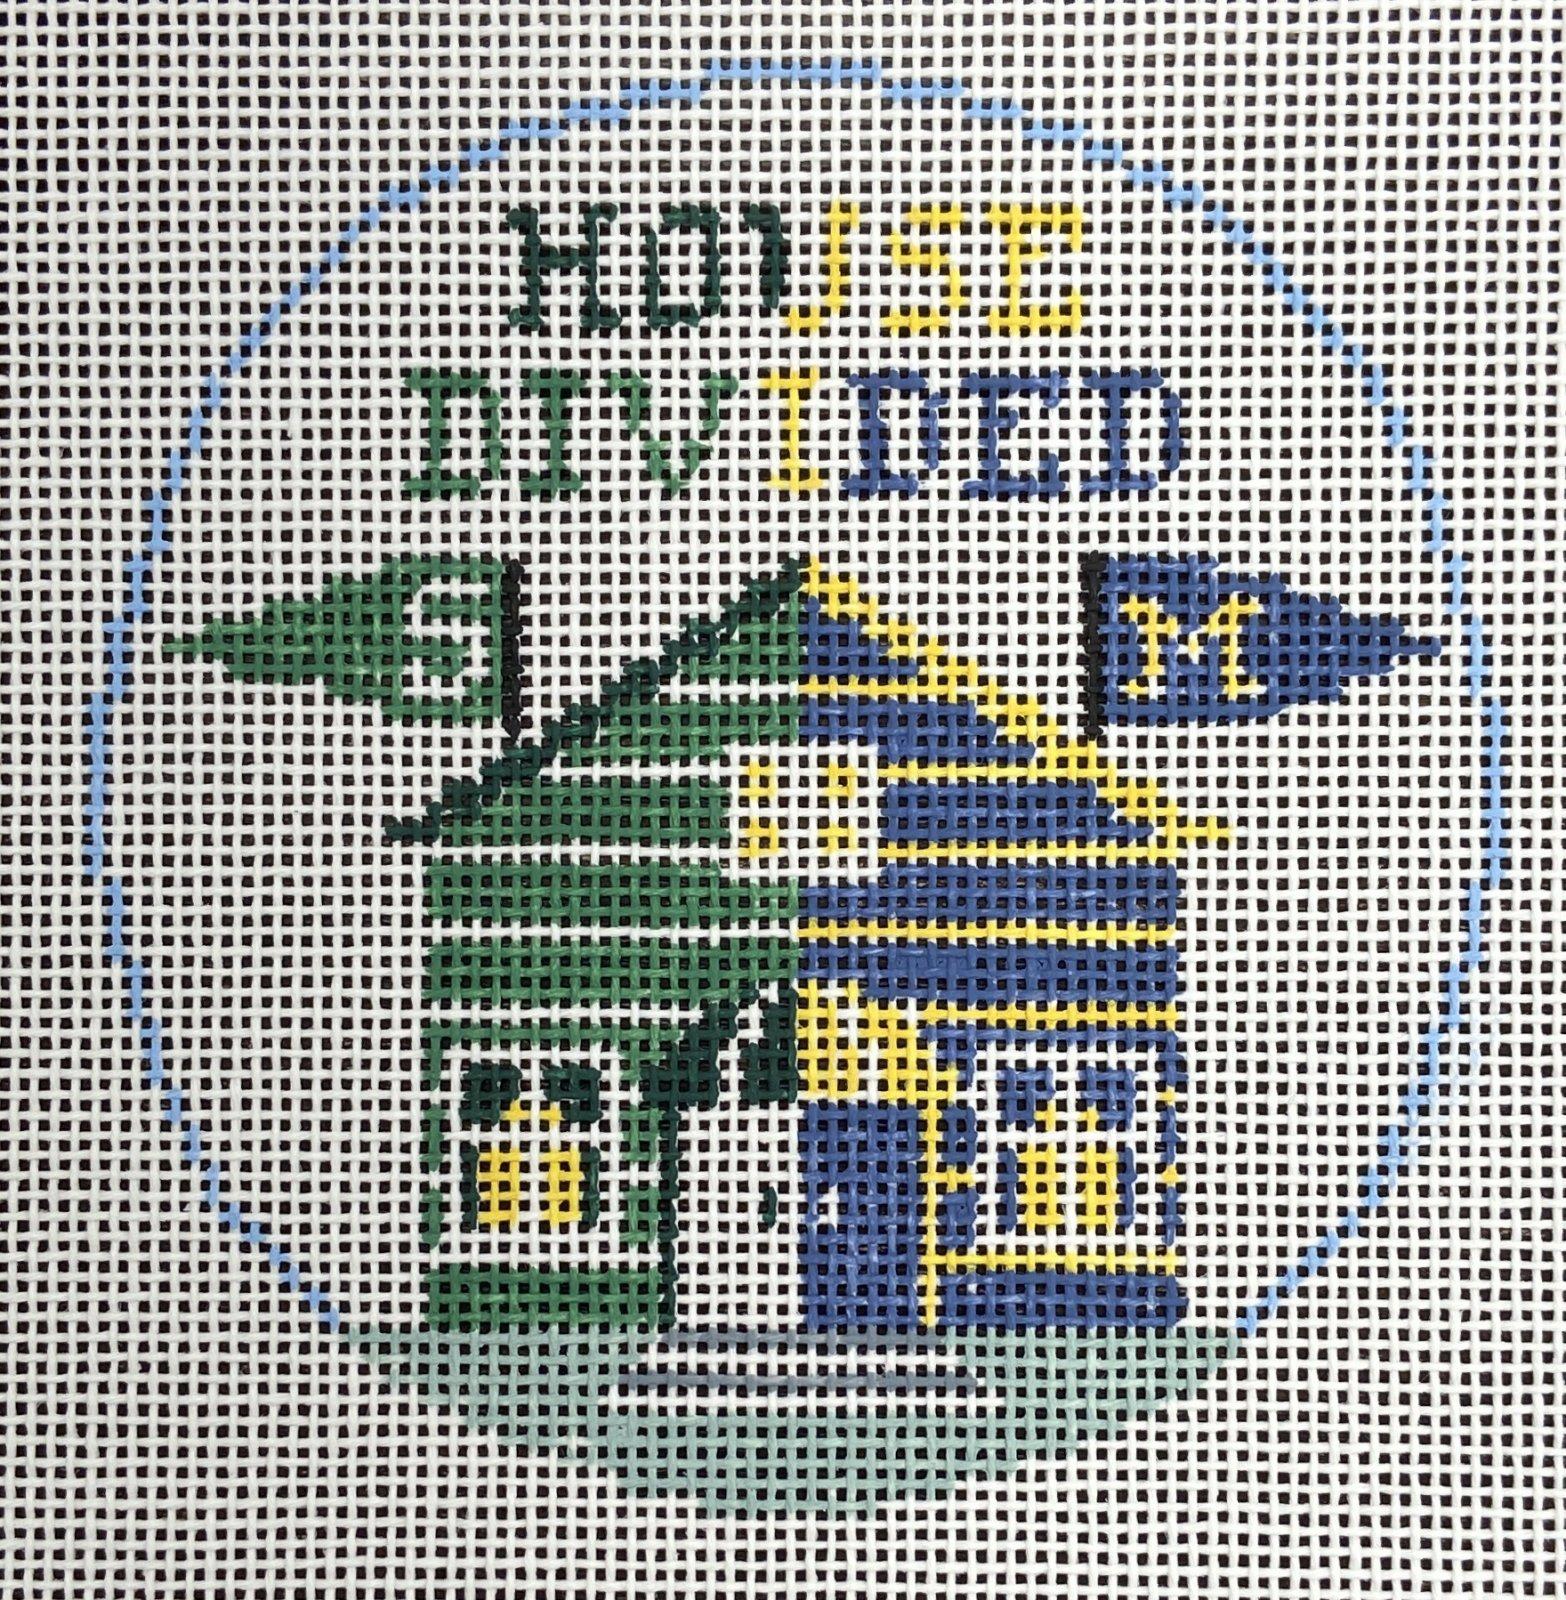 BT269N House Divided Michigan State University of Michigan Ornament Kathy Schenkel